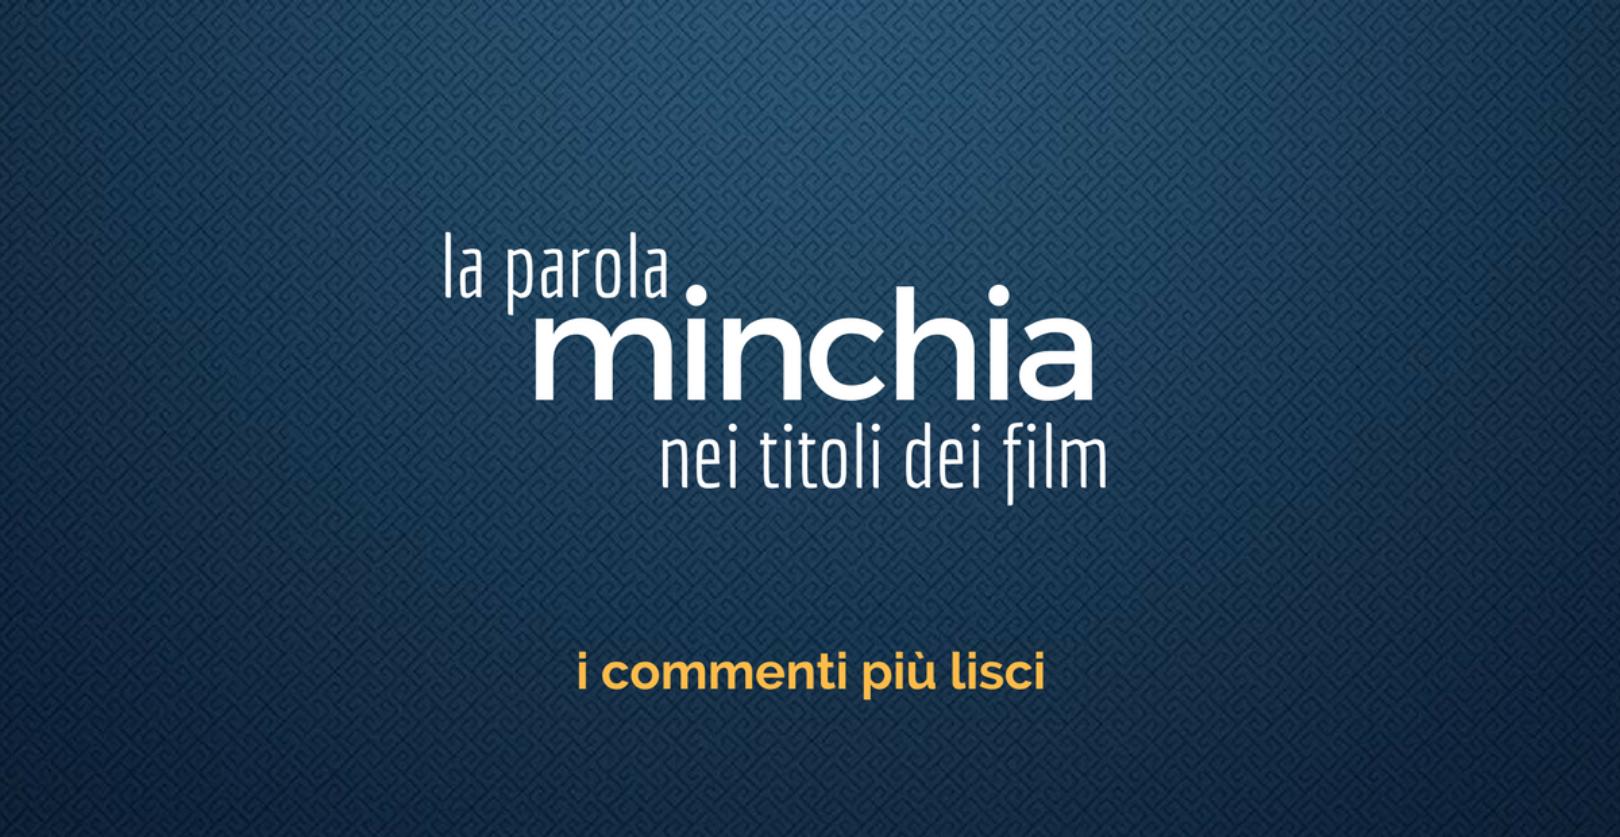 minchia